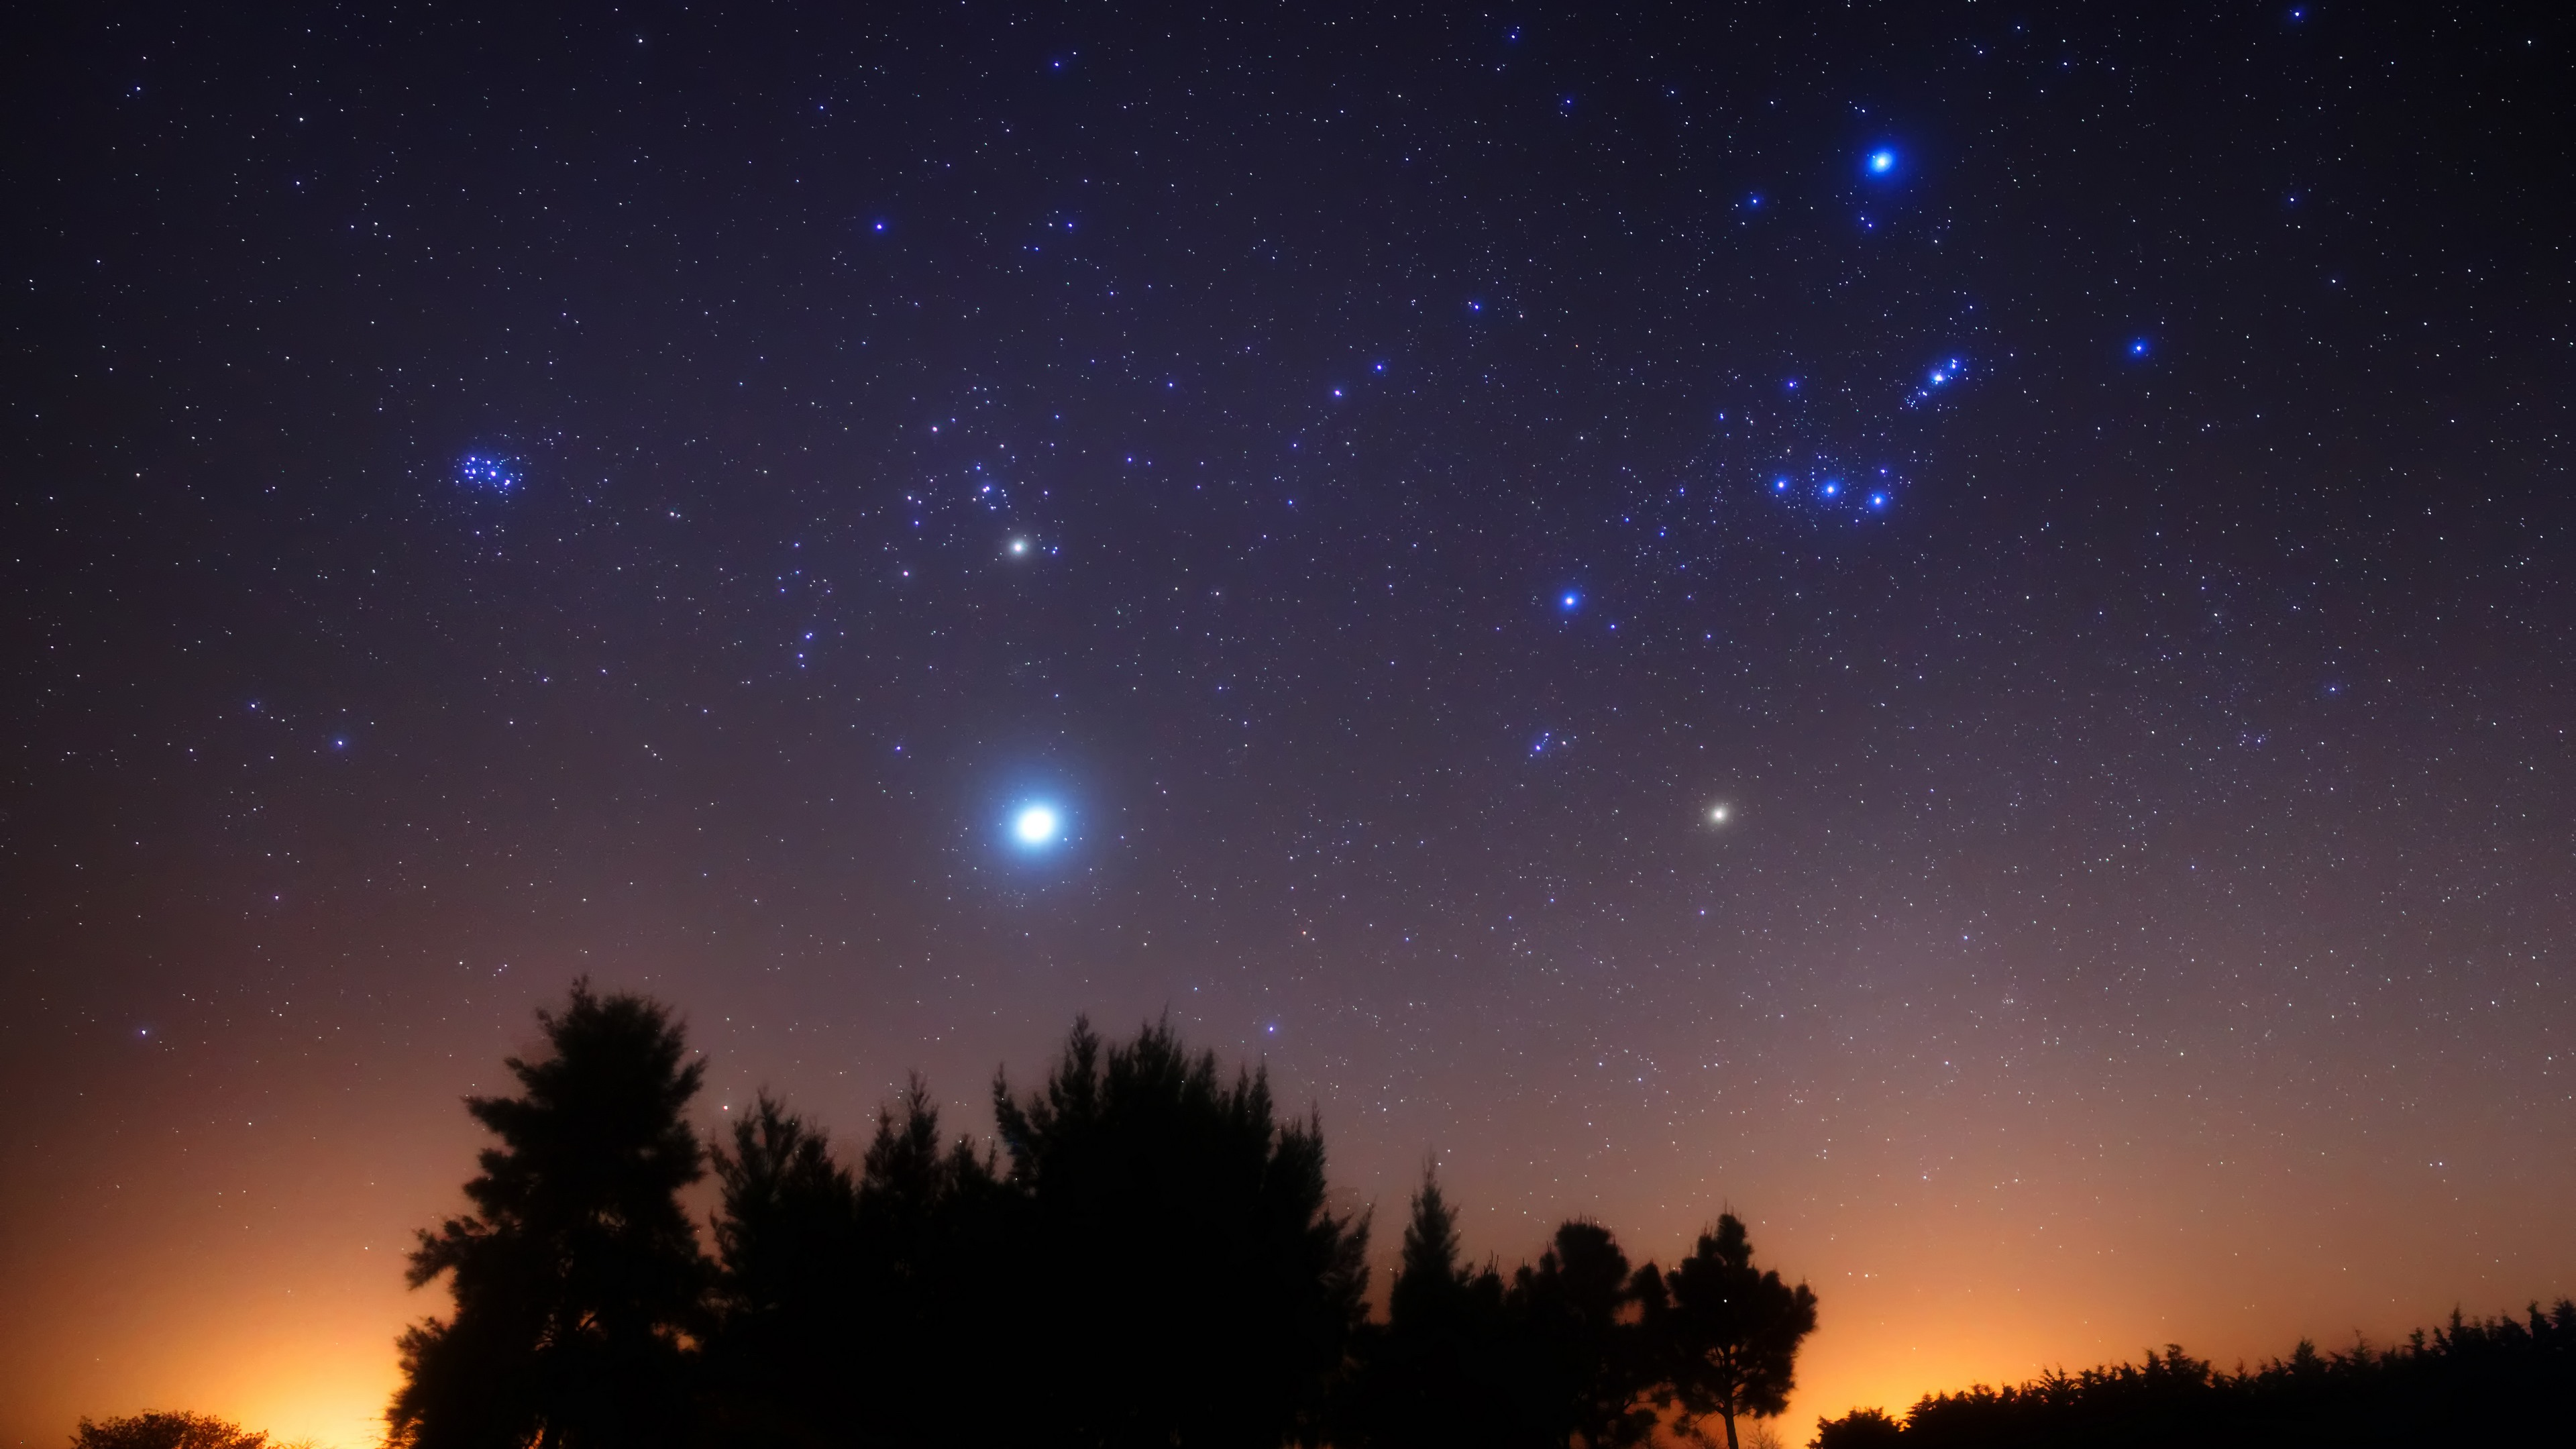 Картинки звезда с неба